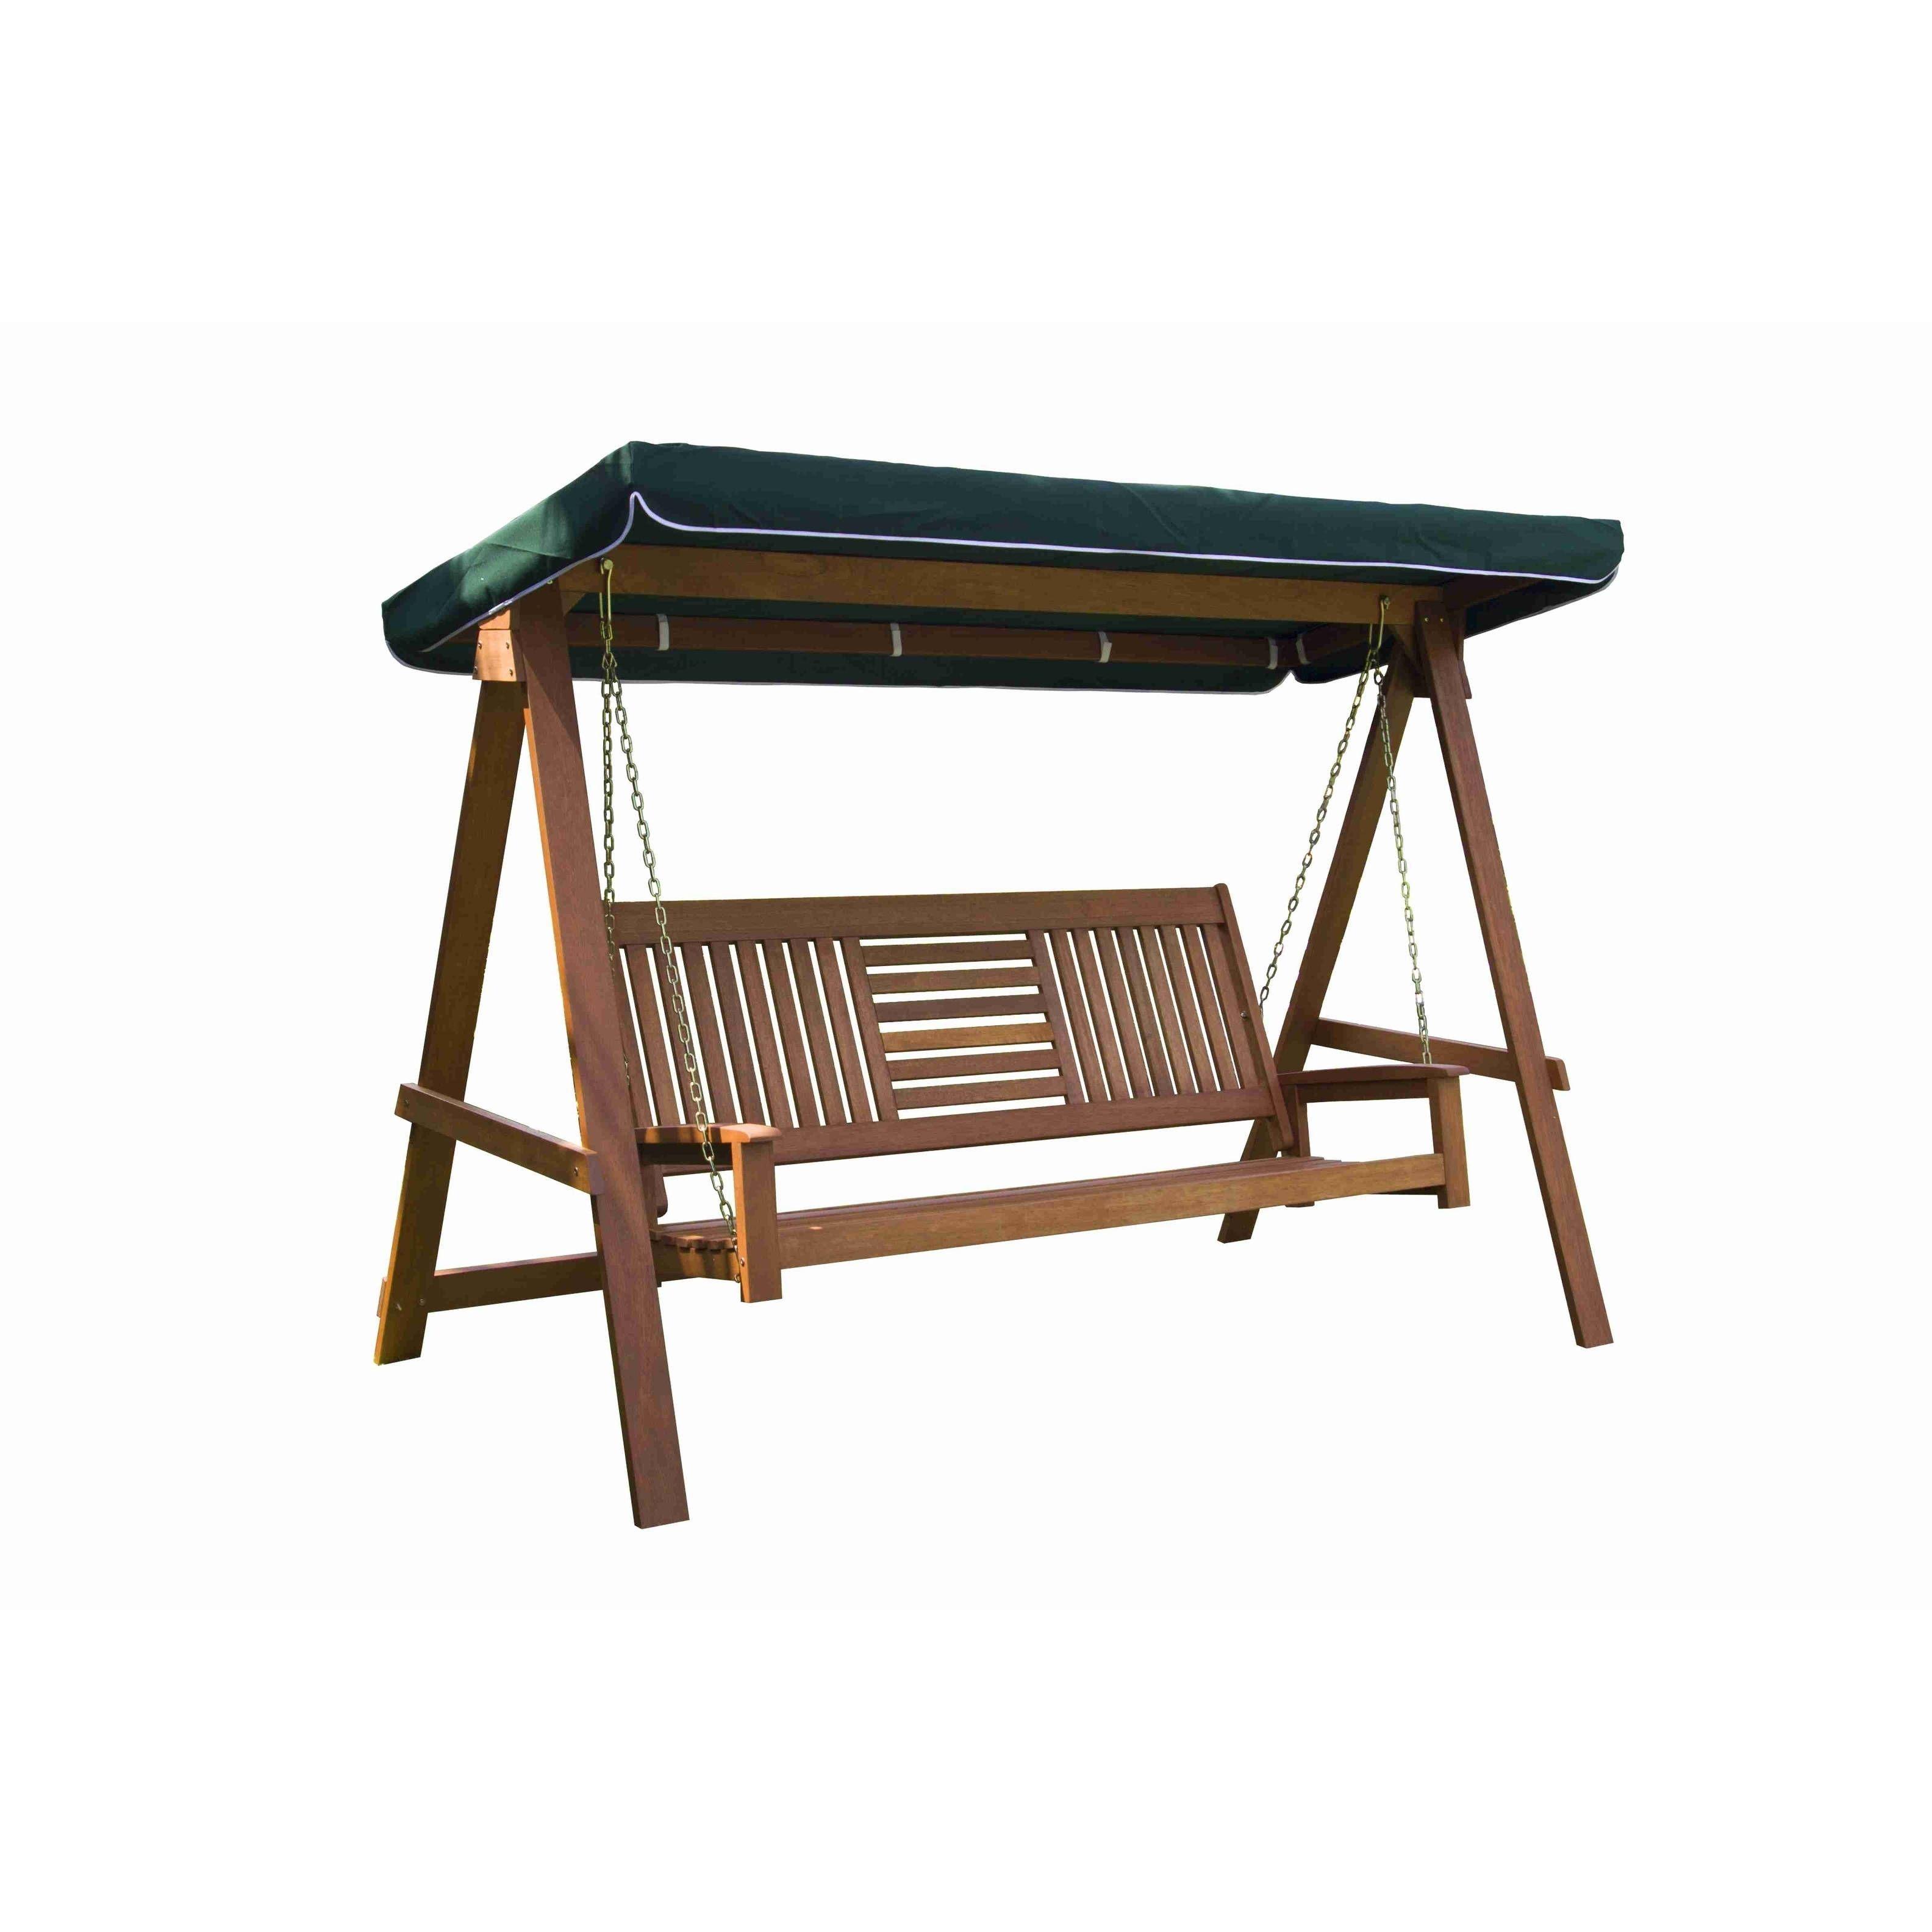 Sun Brown/Green Wood/Fabric 3-seater Canopy Swing #110205017 Patio  sc 1 st  Pinterest & Sun Brown/Green Wood/Fabric 3-seater Canopy Swing #110205017 ...